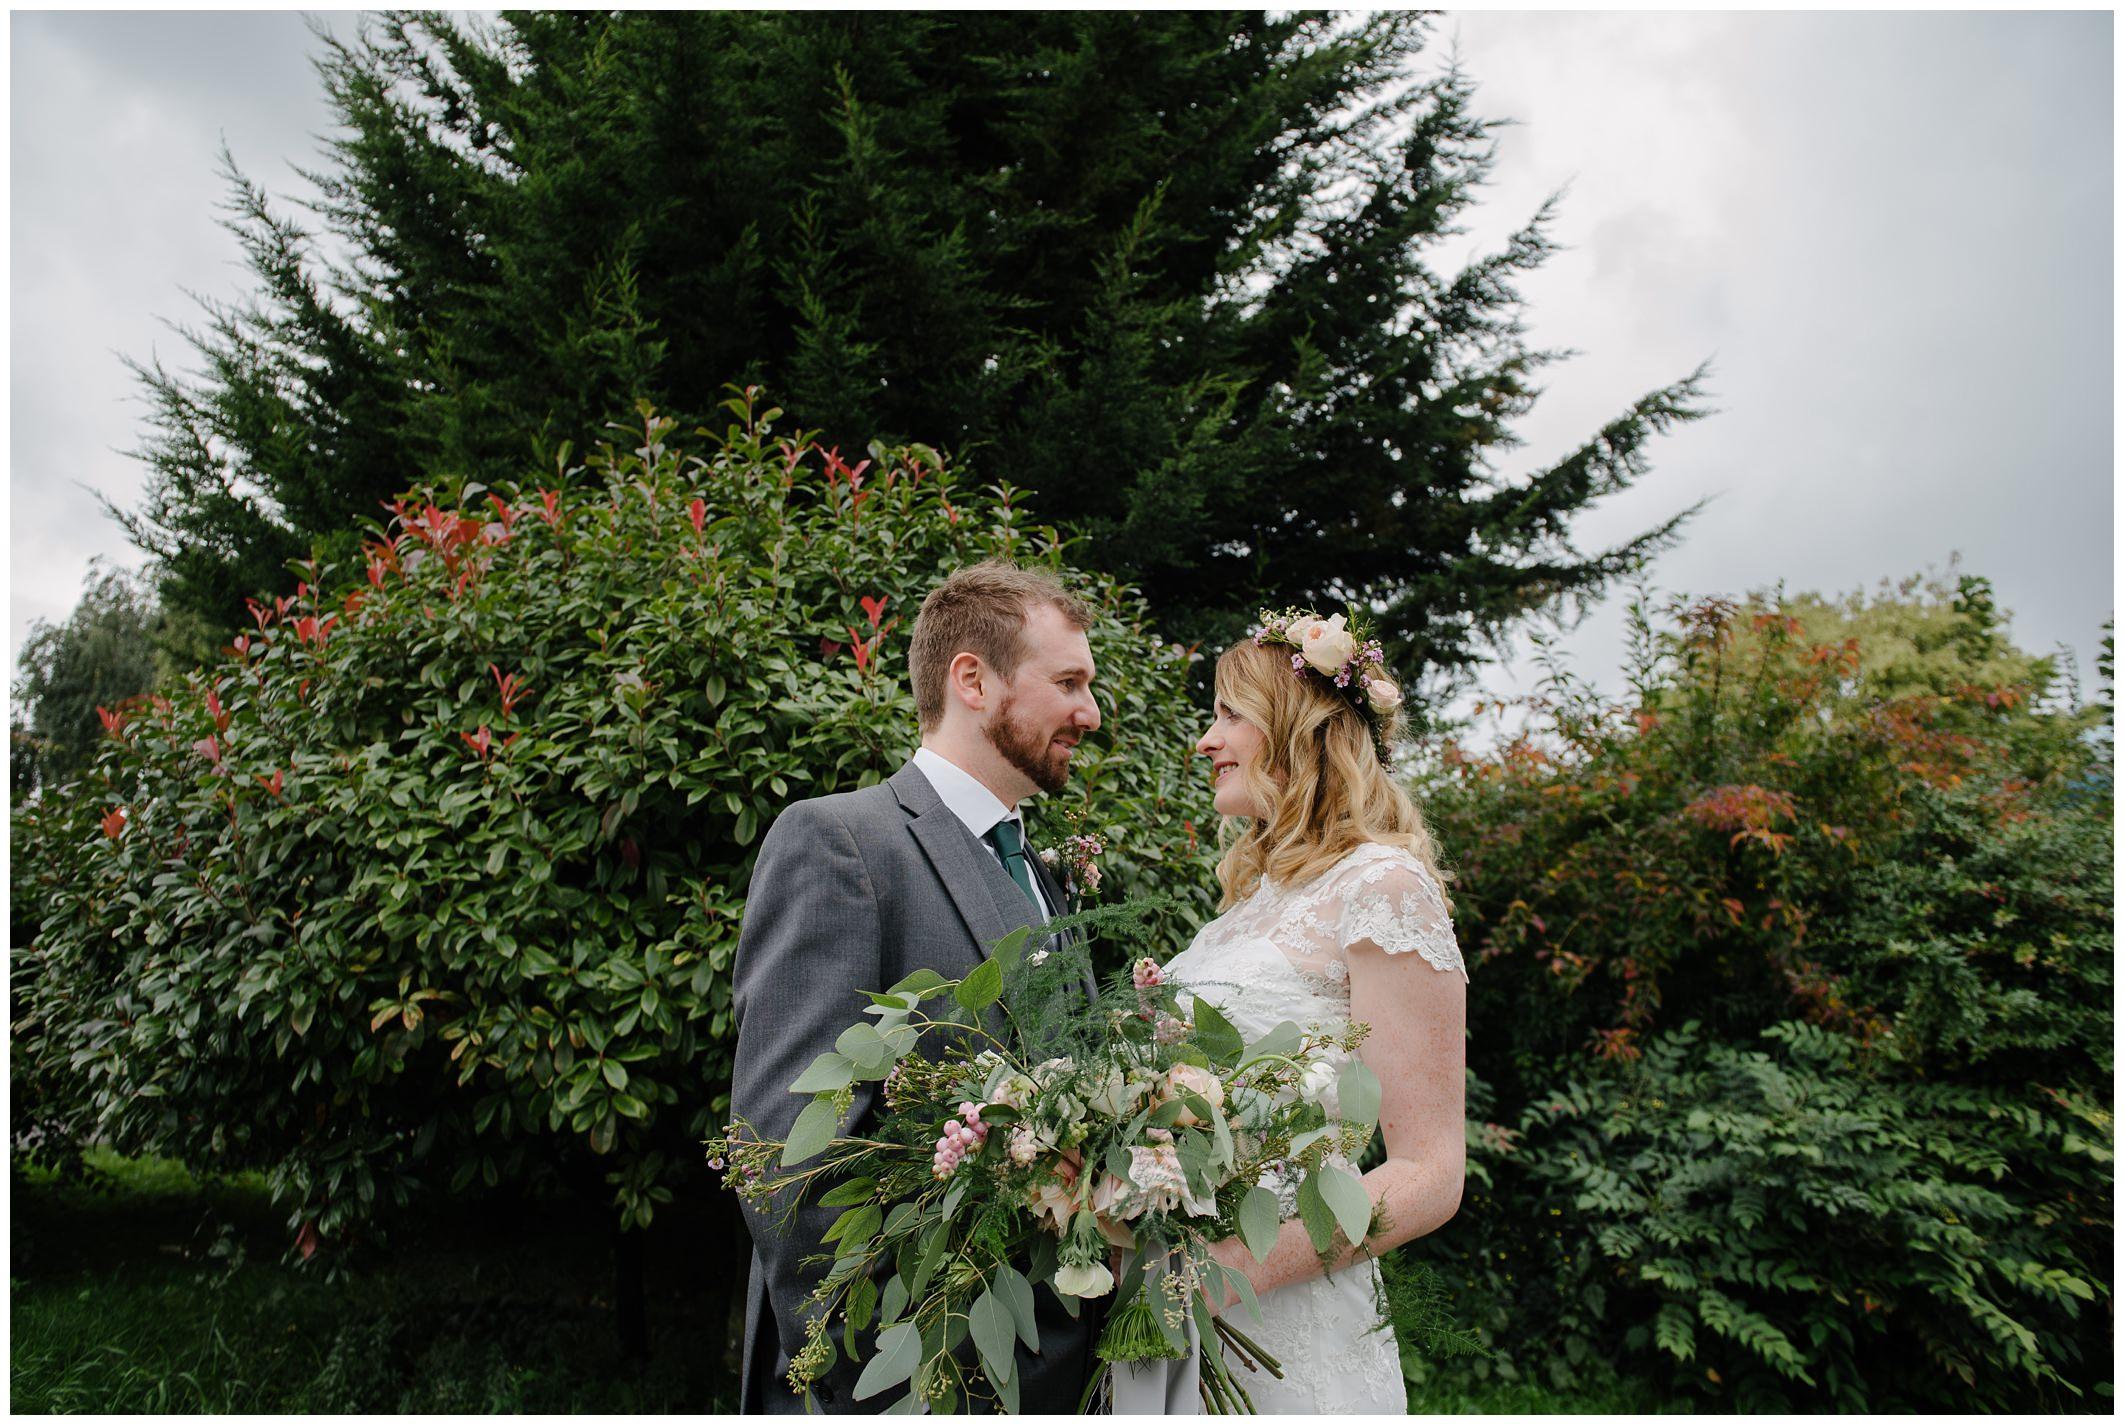 asylum_chapel_peckham_rosendale_wedding_jude_browne_photography_0102.jpg